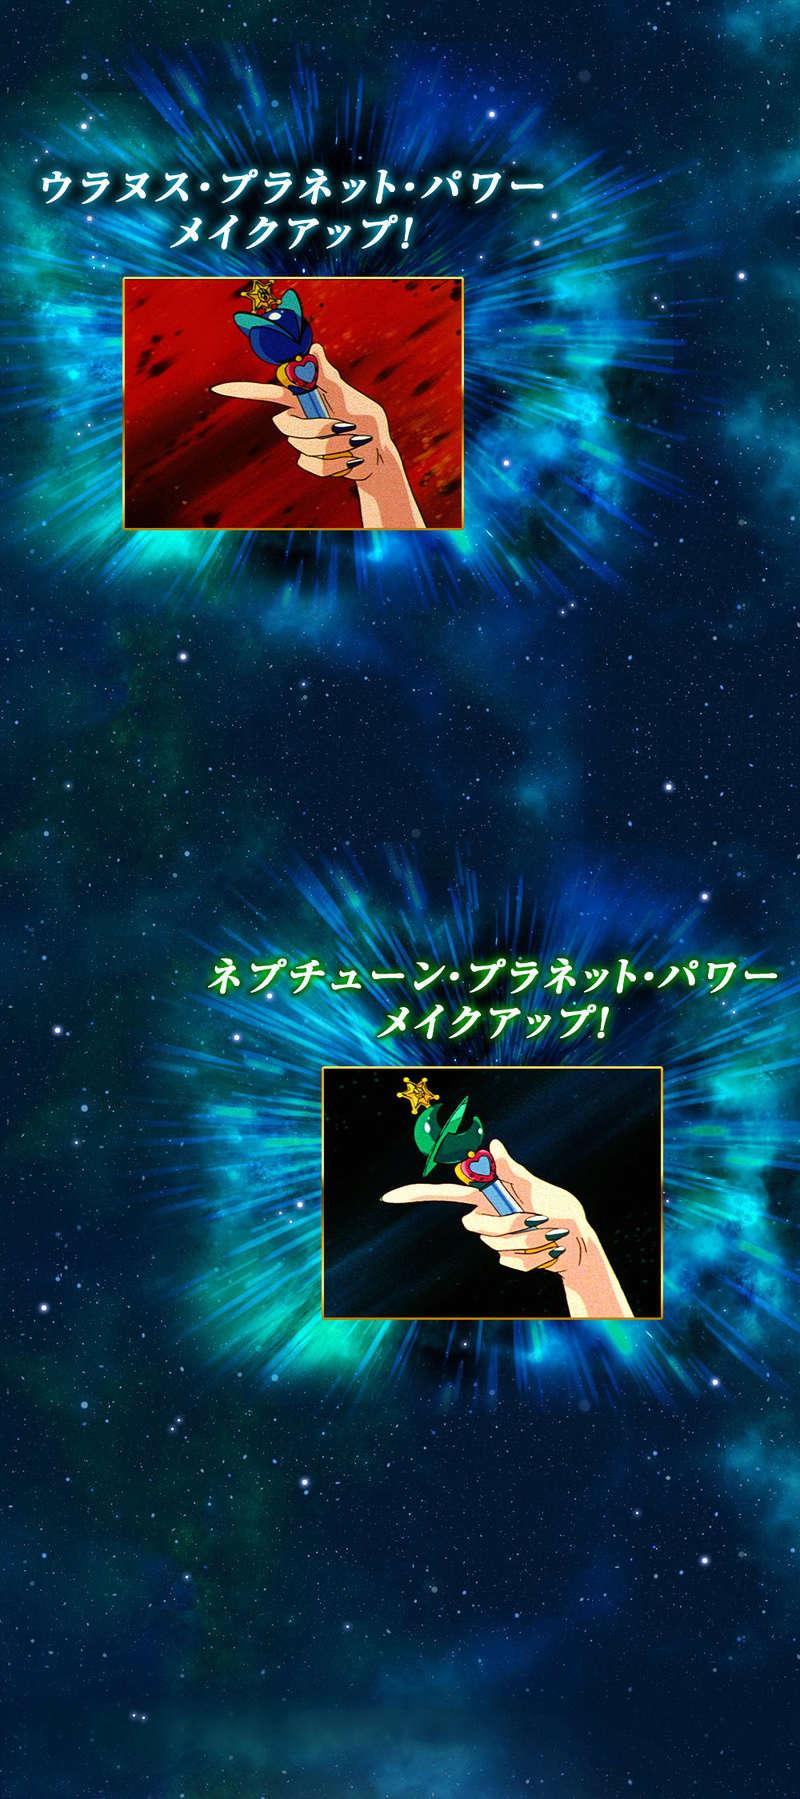 Sailor Moon - Proplica (Bandai) X9im10